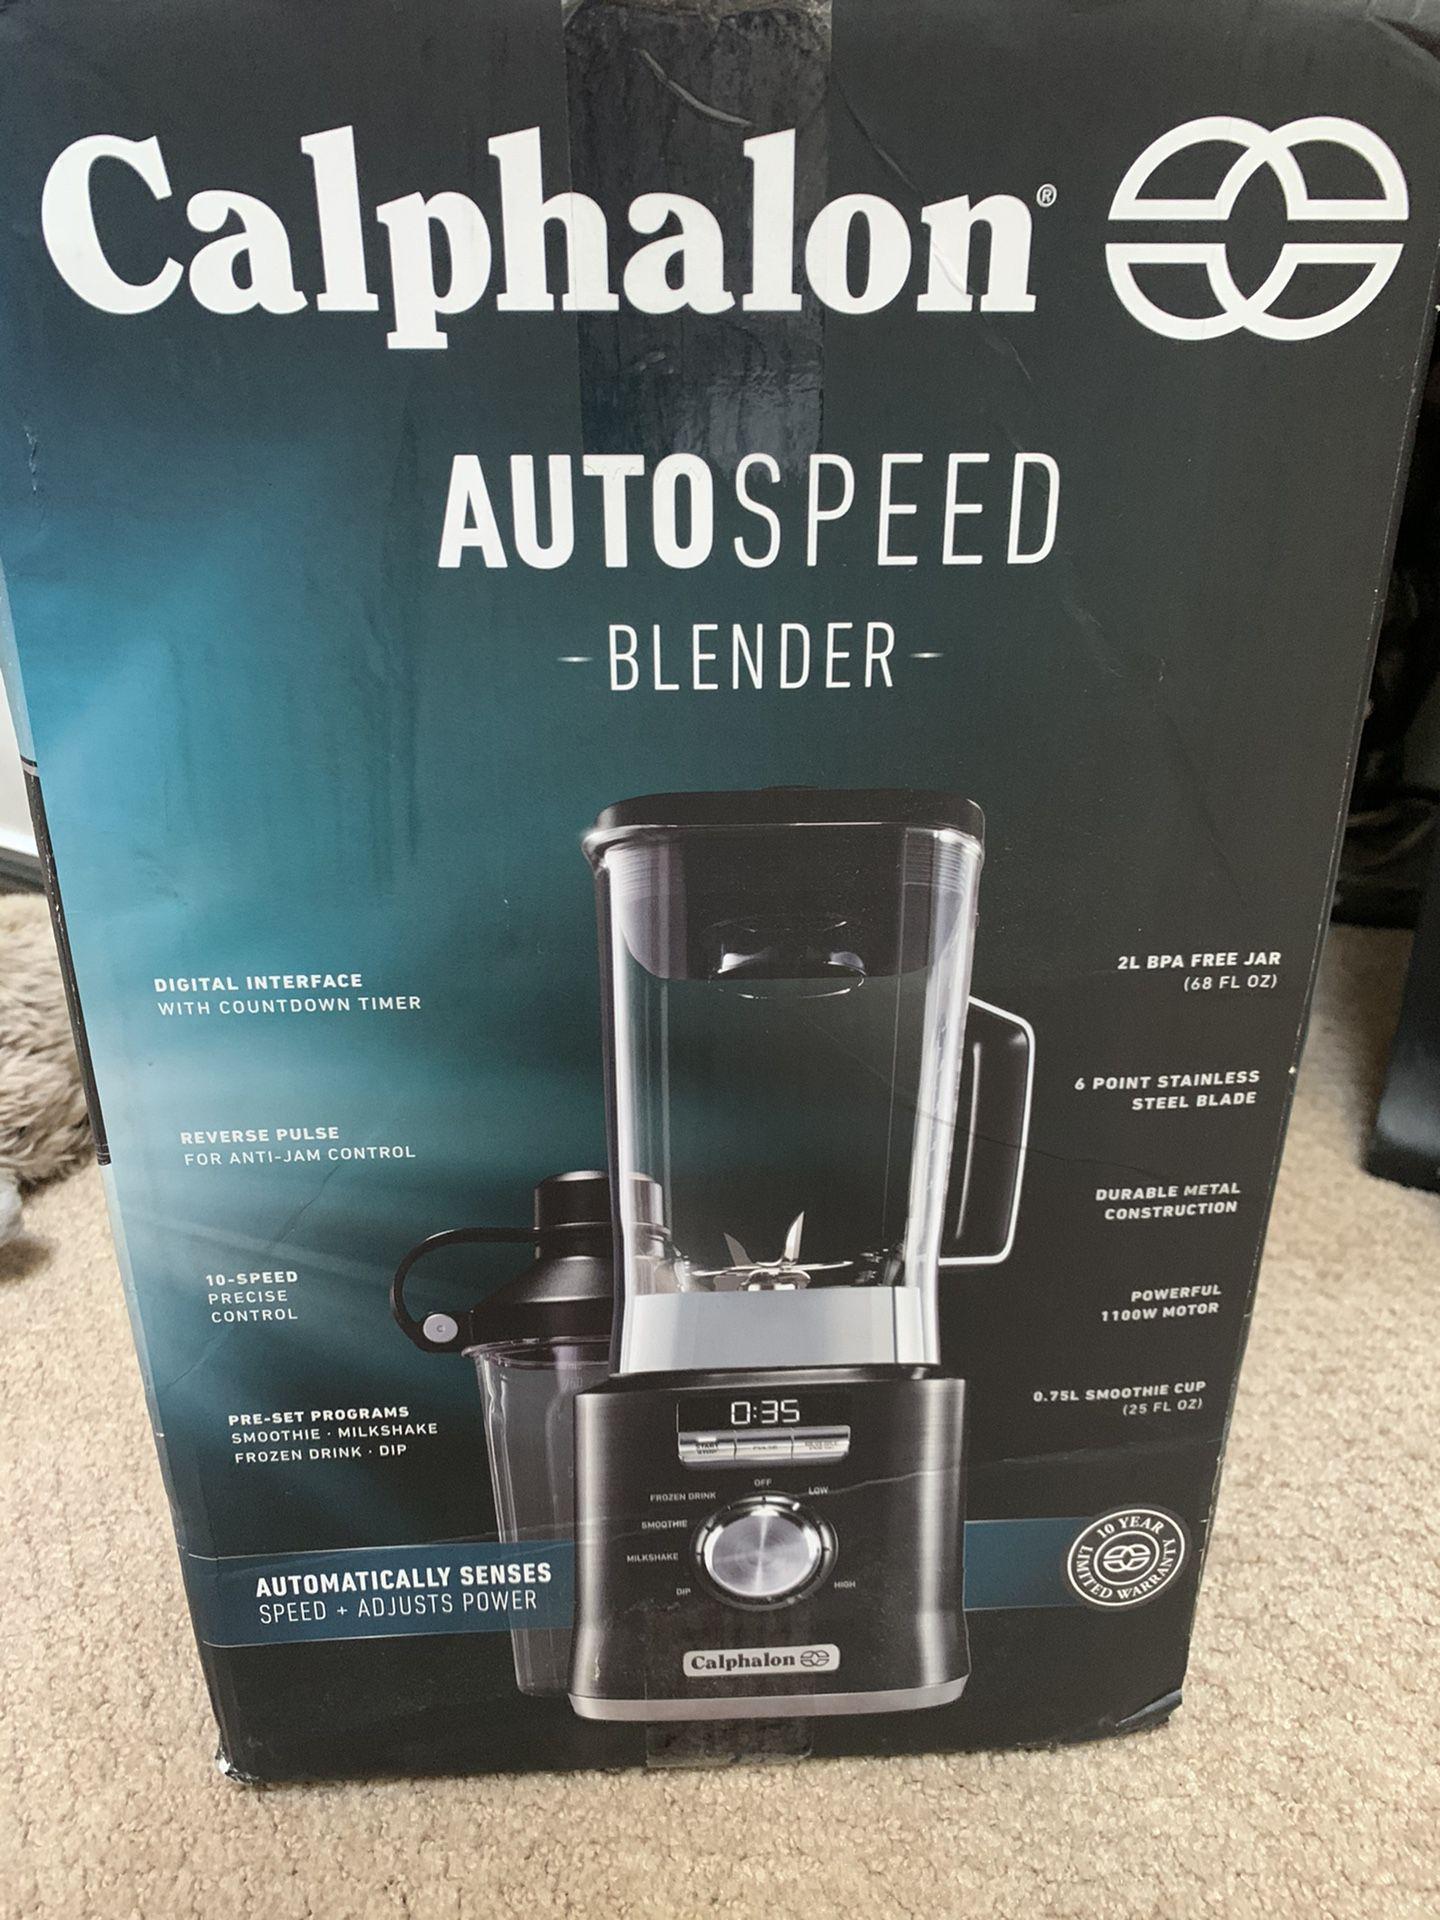 NEW/UNOPENED Calphalon Auto Speed Blender